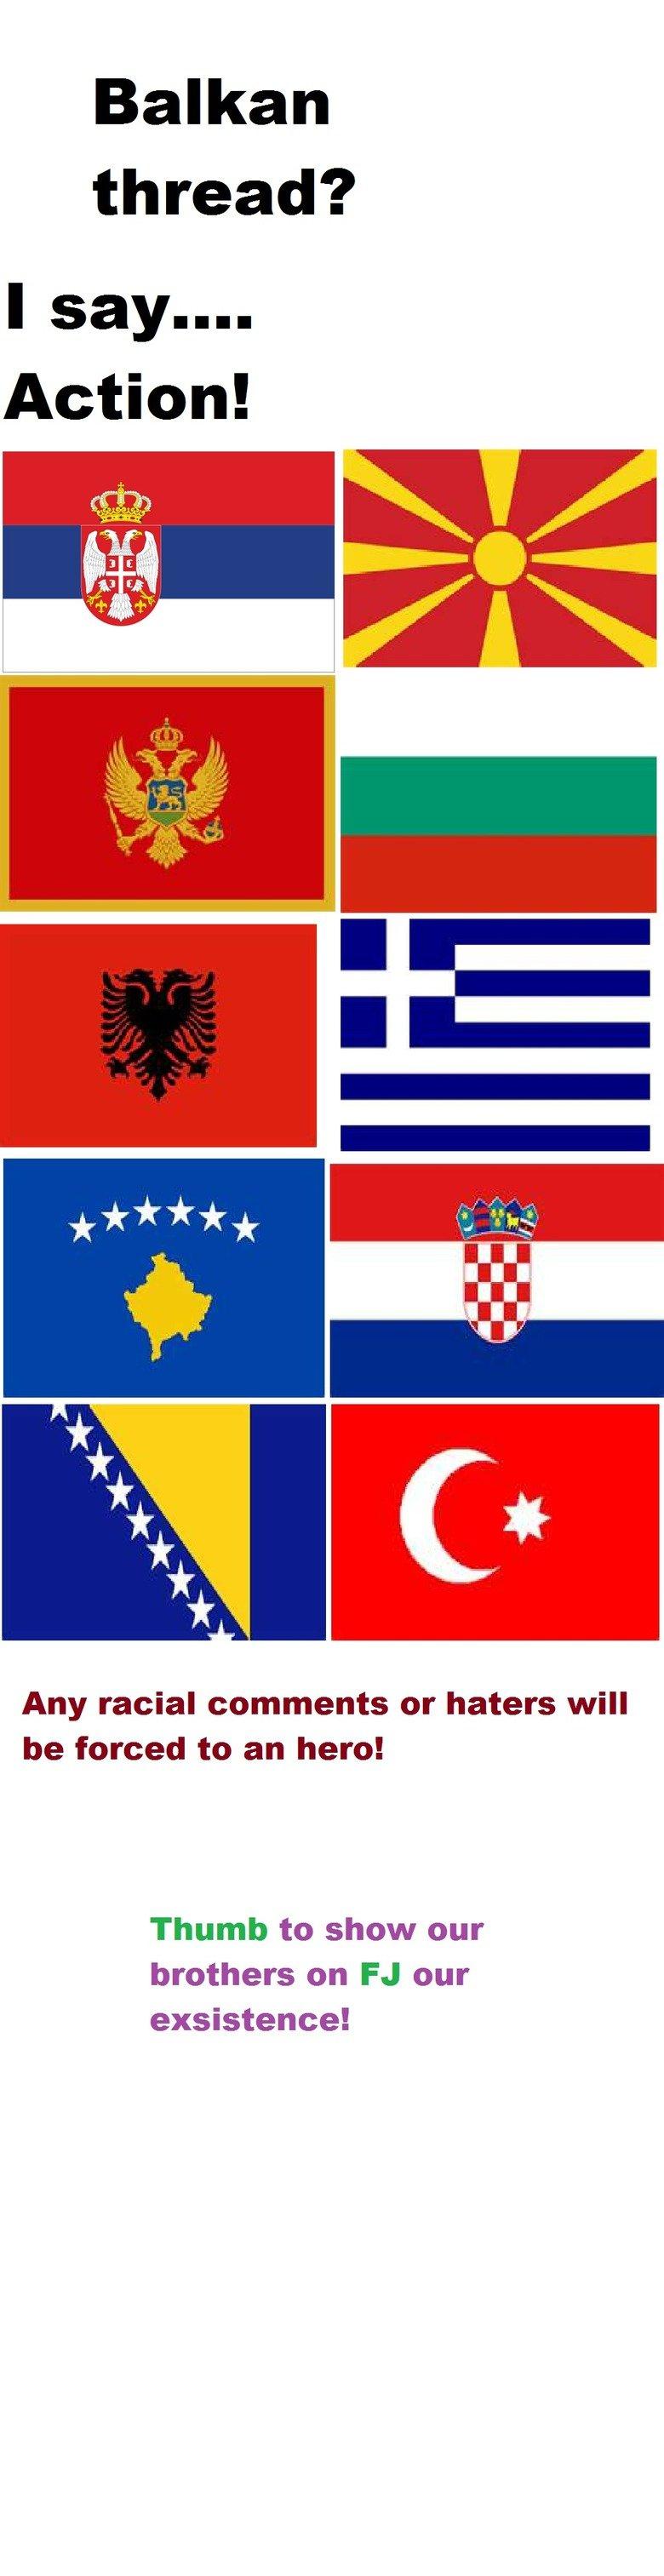 Balkan Thread 1!. Serbija, Shqiptar, Crna Gora, Bosna e Herzengovina, Hrvatska, Turkiye, Romania,Bulgariya!.. I dont even understand the point of this